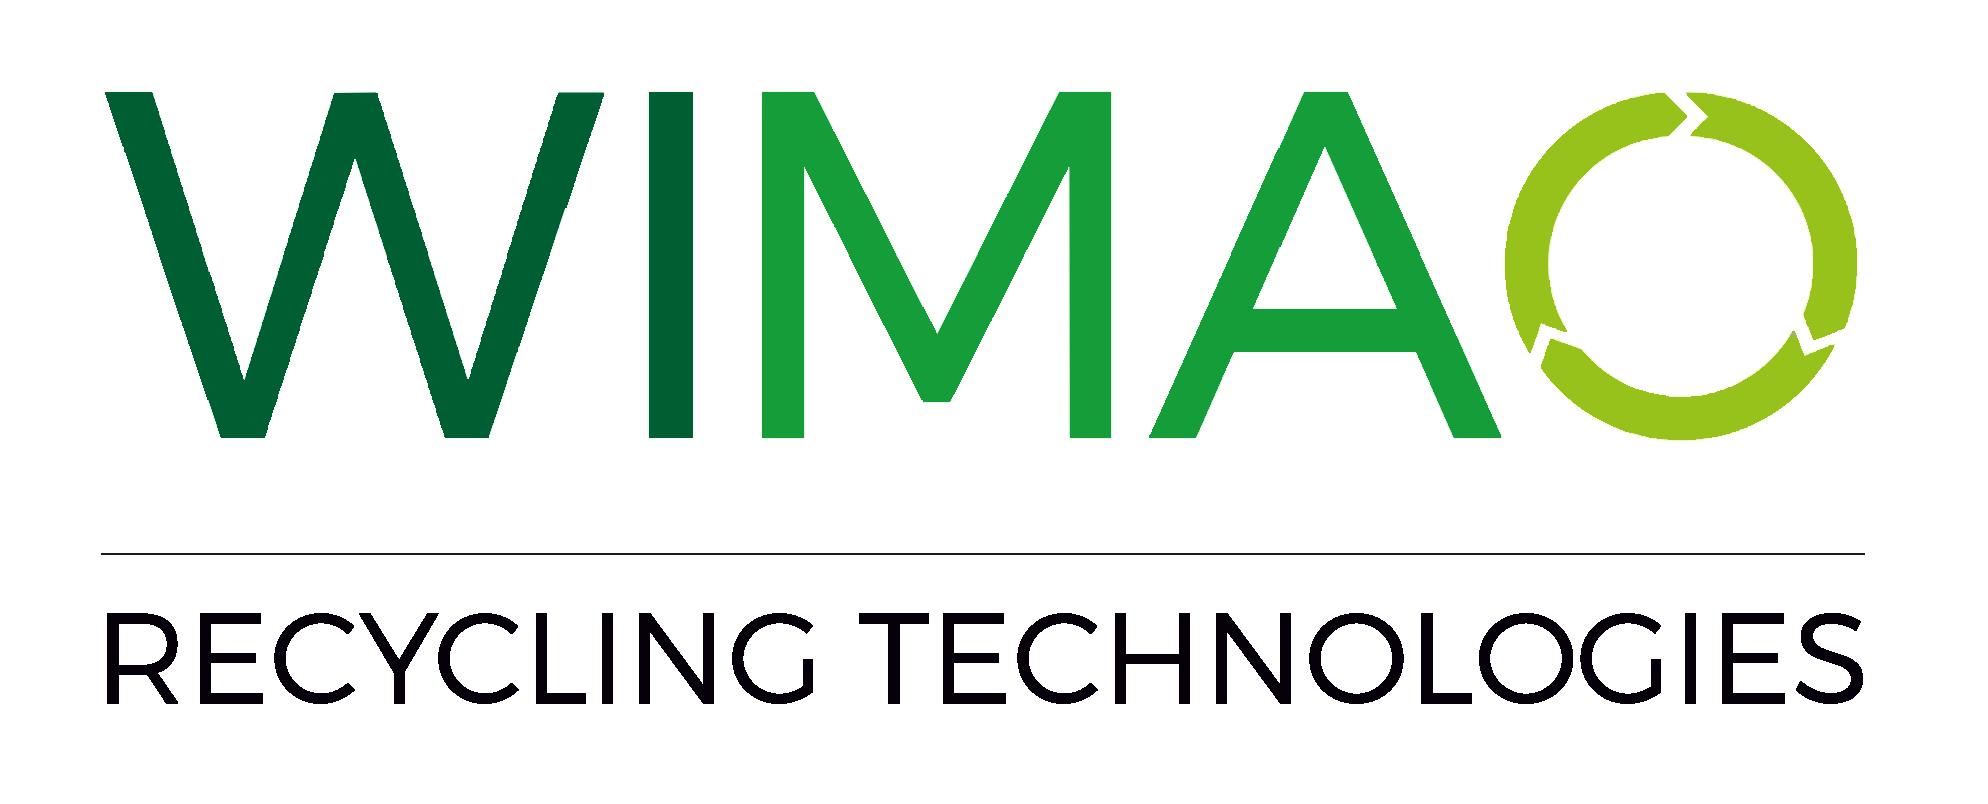 https://europeanplasticspact.org/wp-content/uploads/2021/05/wimao-ltd-logo-vektori.png